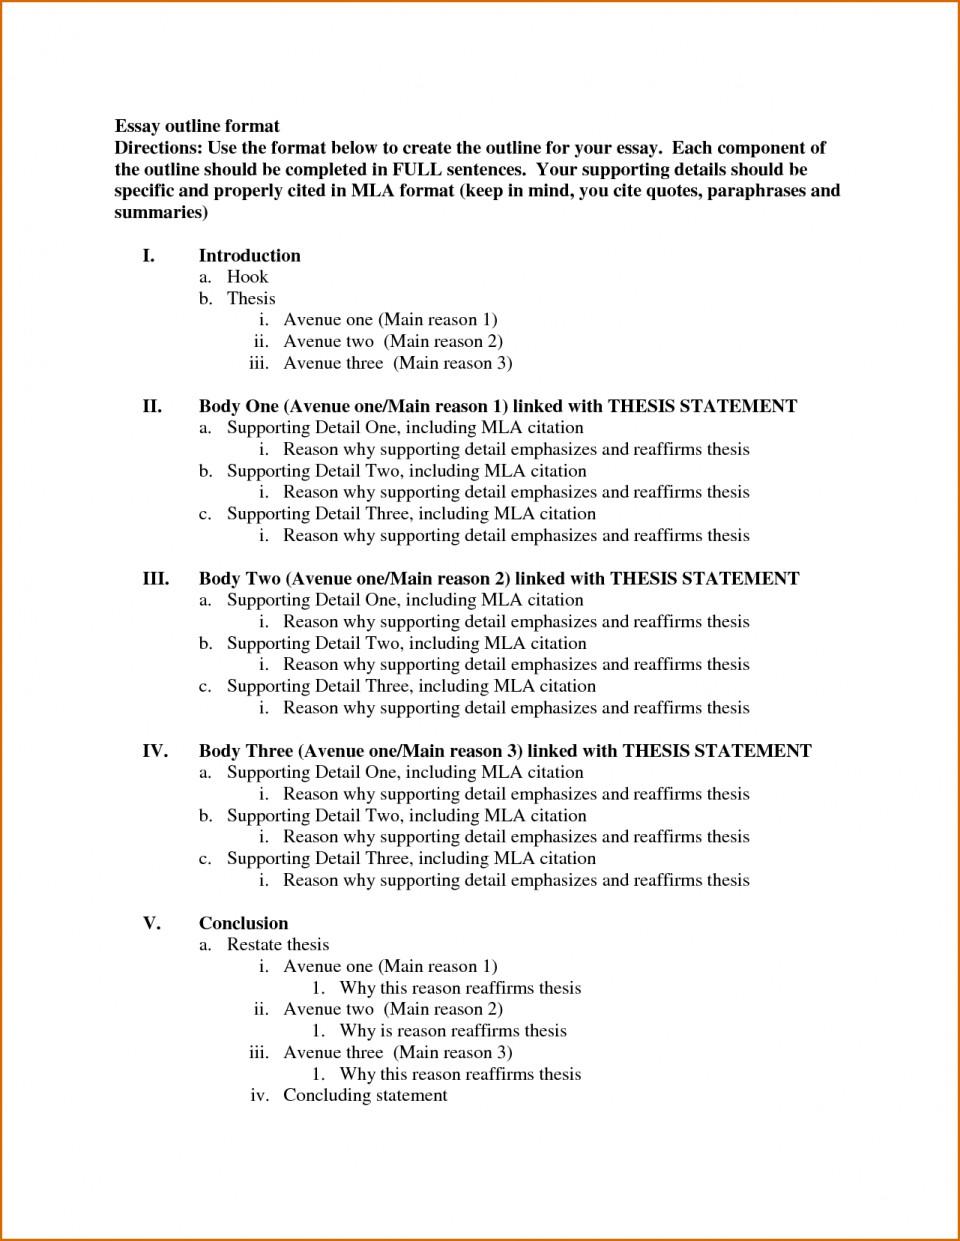 006 Template Essay Outline Example Excellent Mla Argumentative High School Research Paper Pdf 960